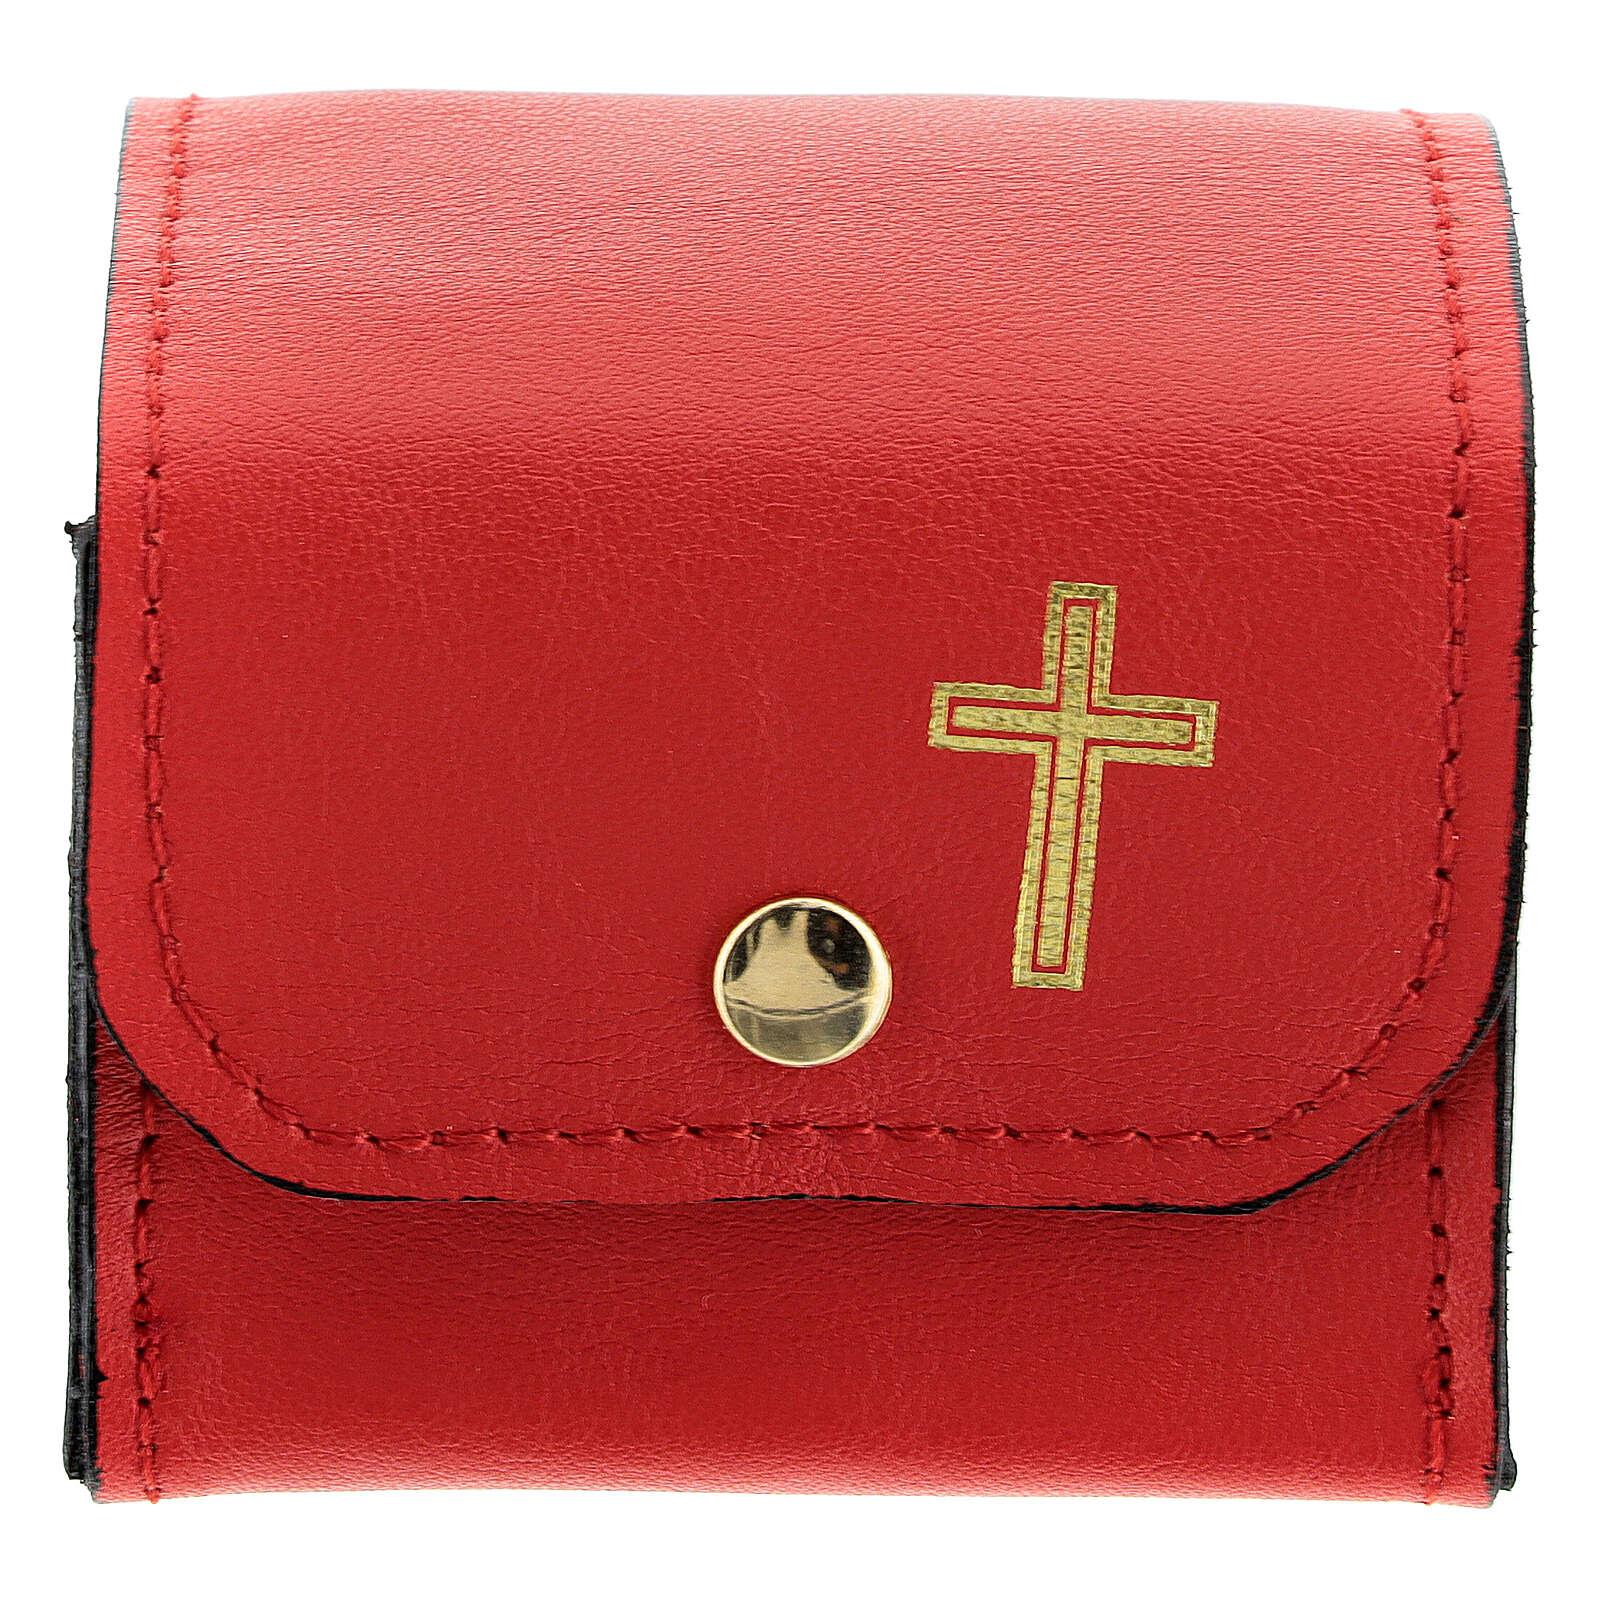 Astuccio porta olio santo vera pelle rosso 3